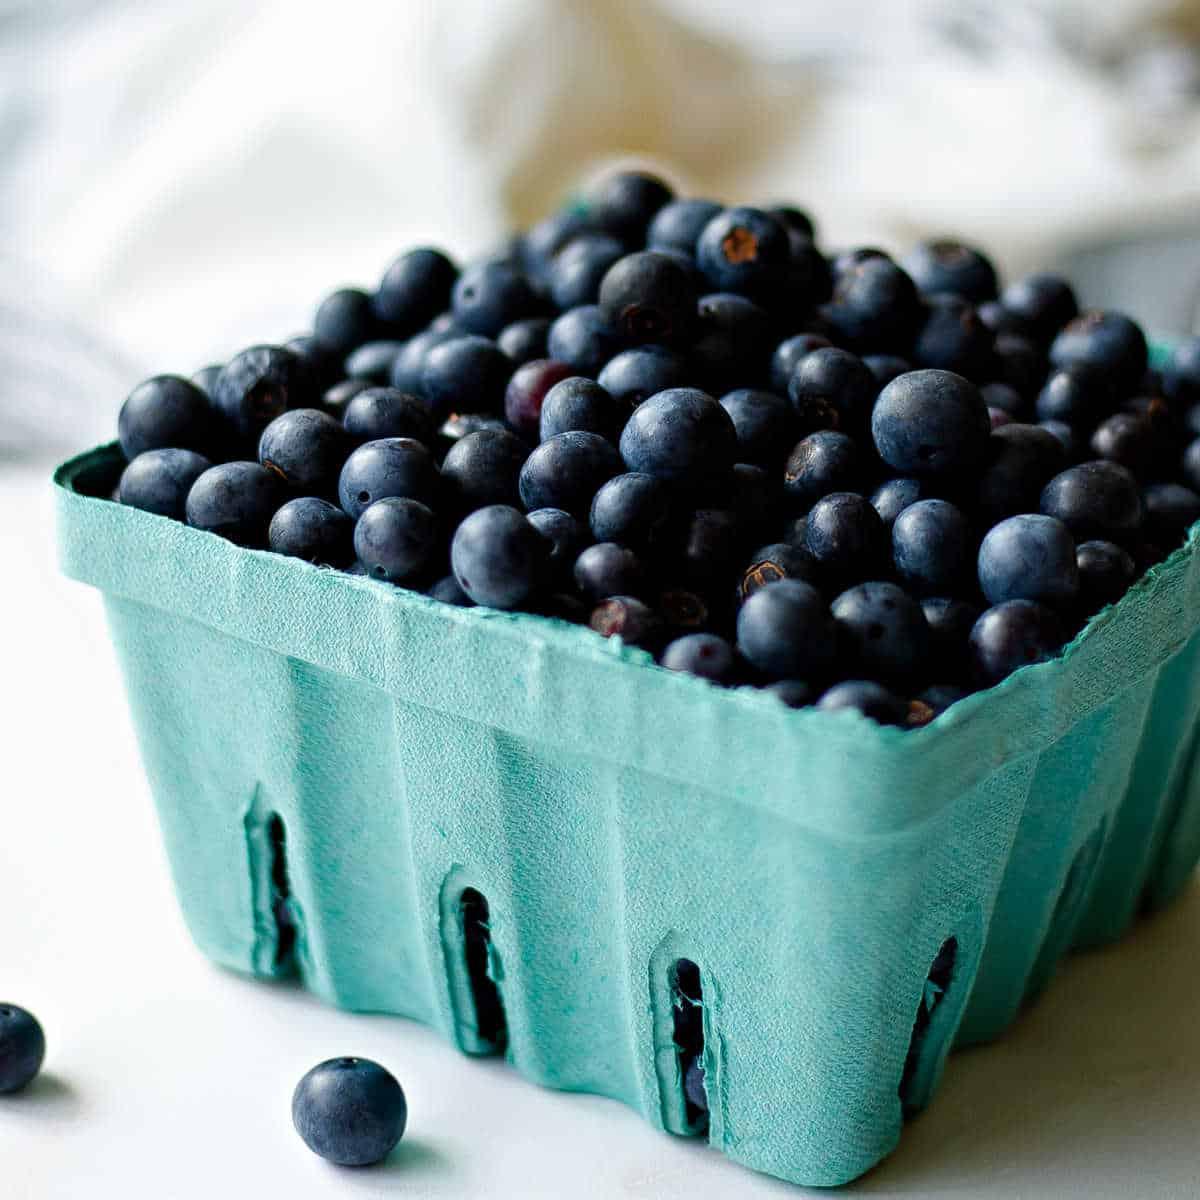 fresh blueberries in a cardboard crate